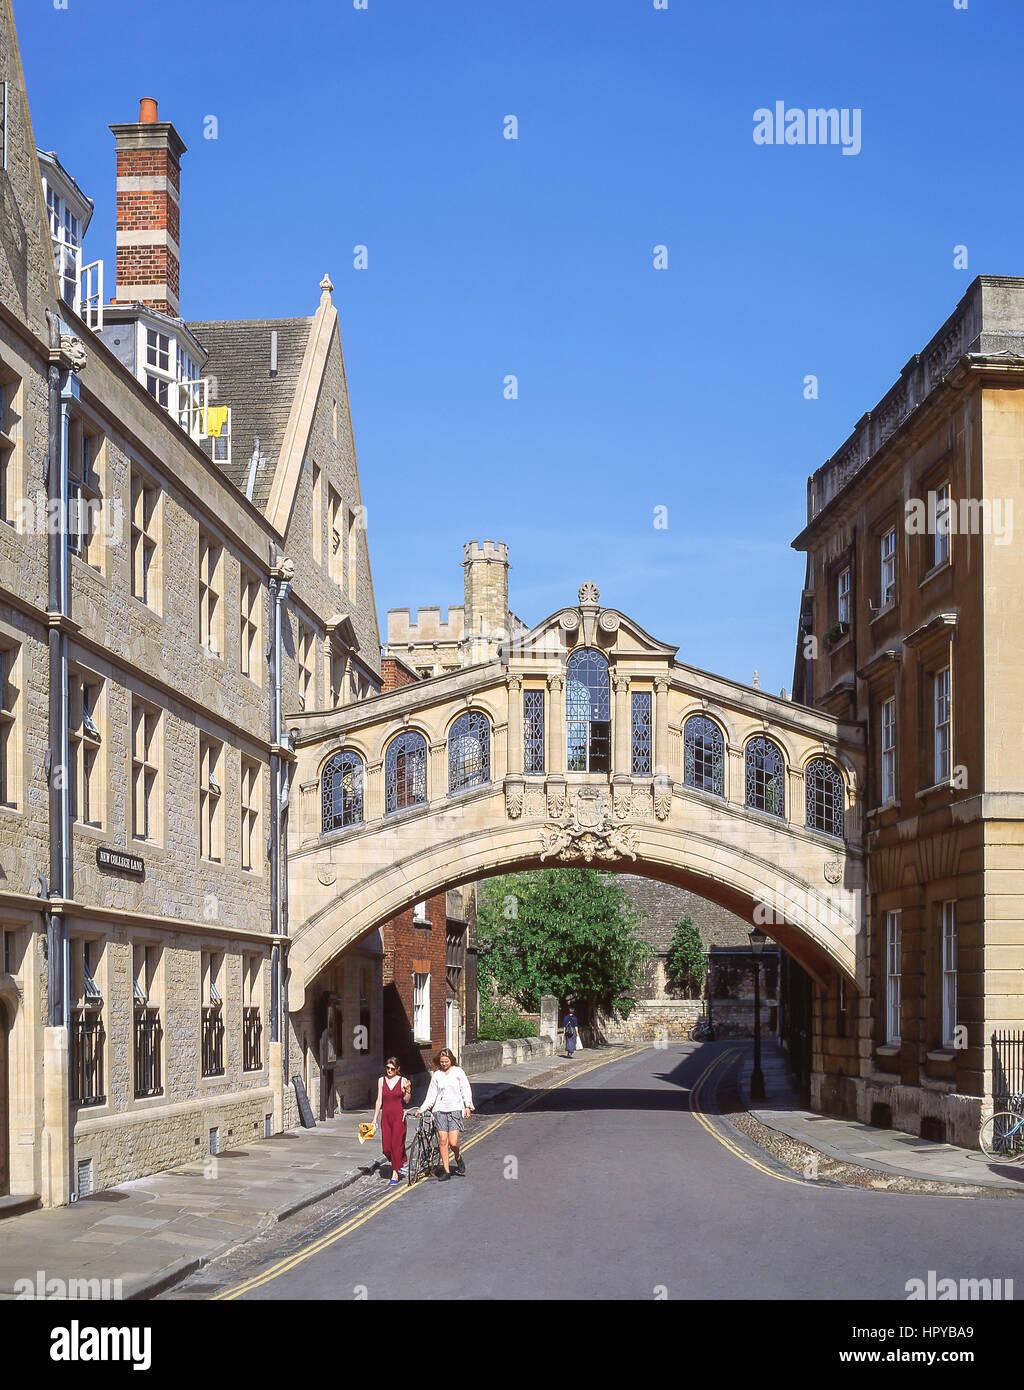 The Bridge of Sighs (Hertford Bridge), New College Lane, Oxford, Oxfordshire, England, United Kingdom - Stock Image